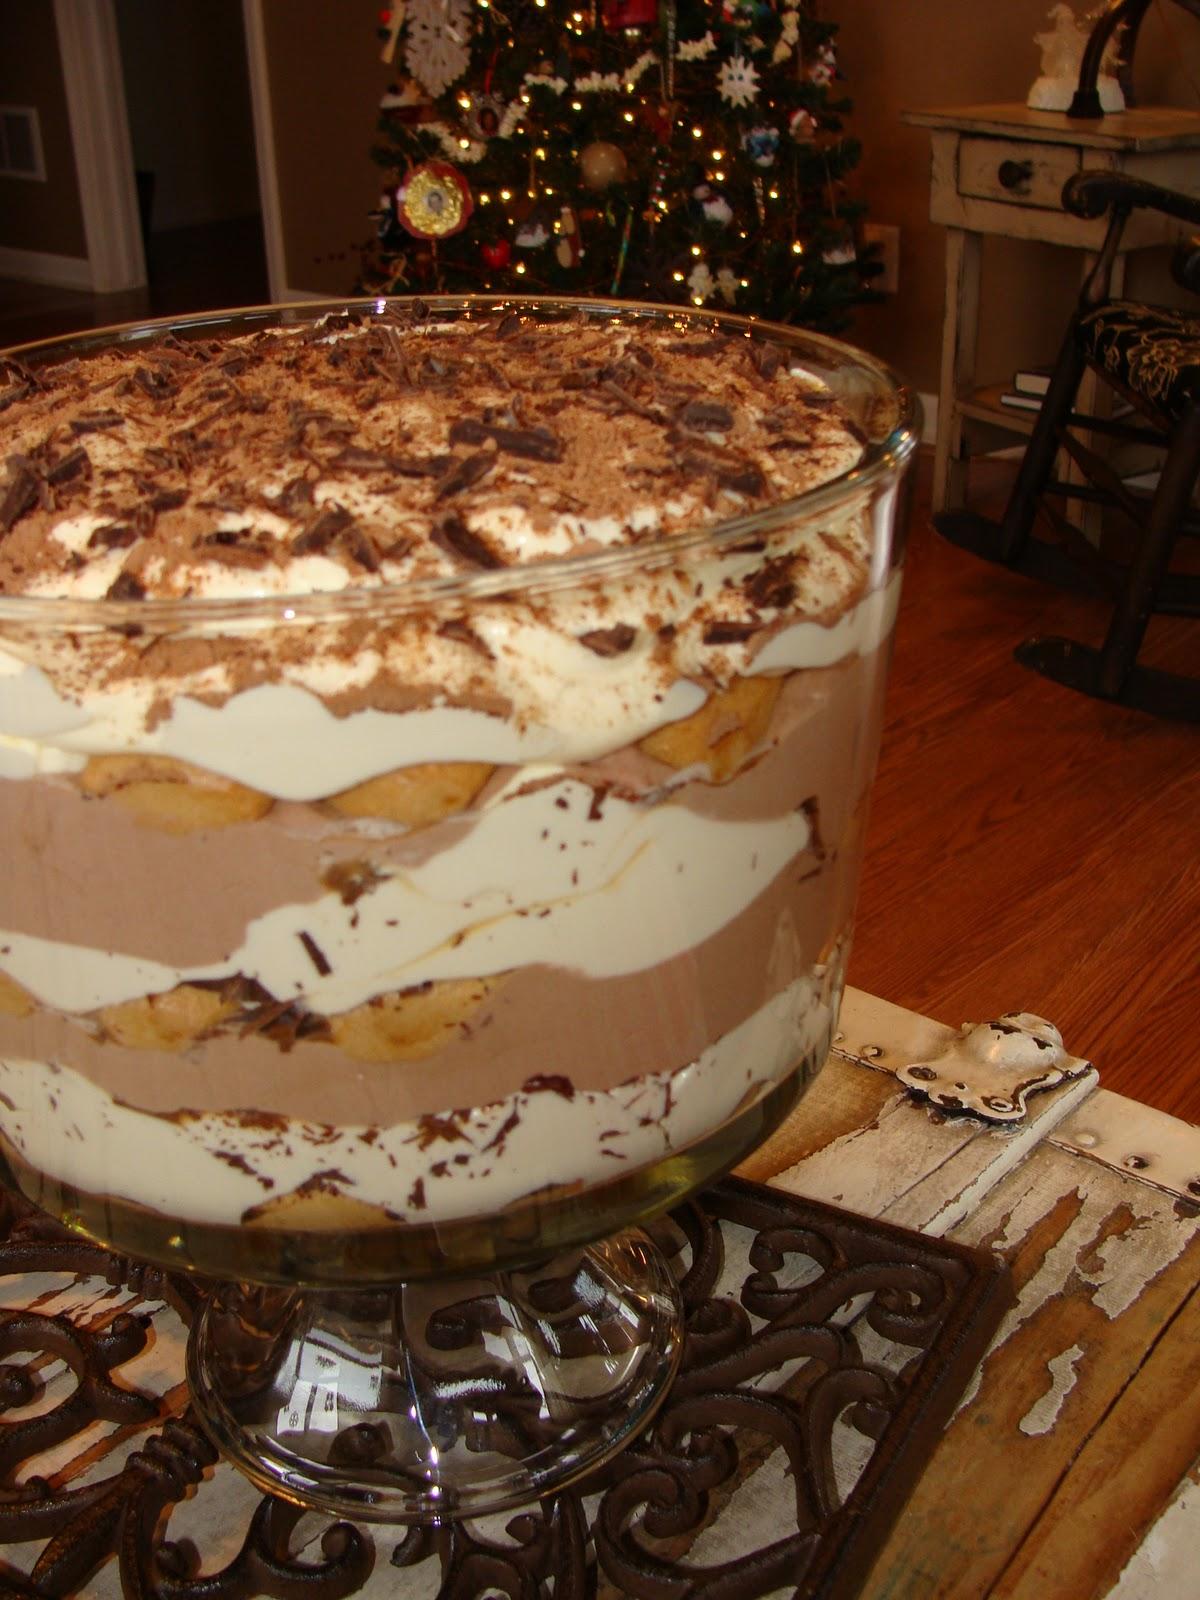 ... tiramisu toffee dessert easy tiramisu dessert tiramisu toffee